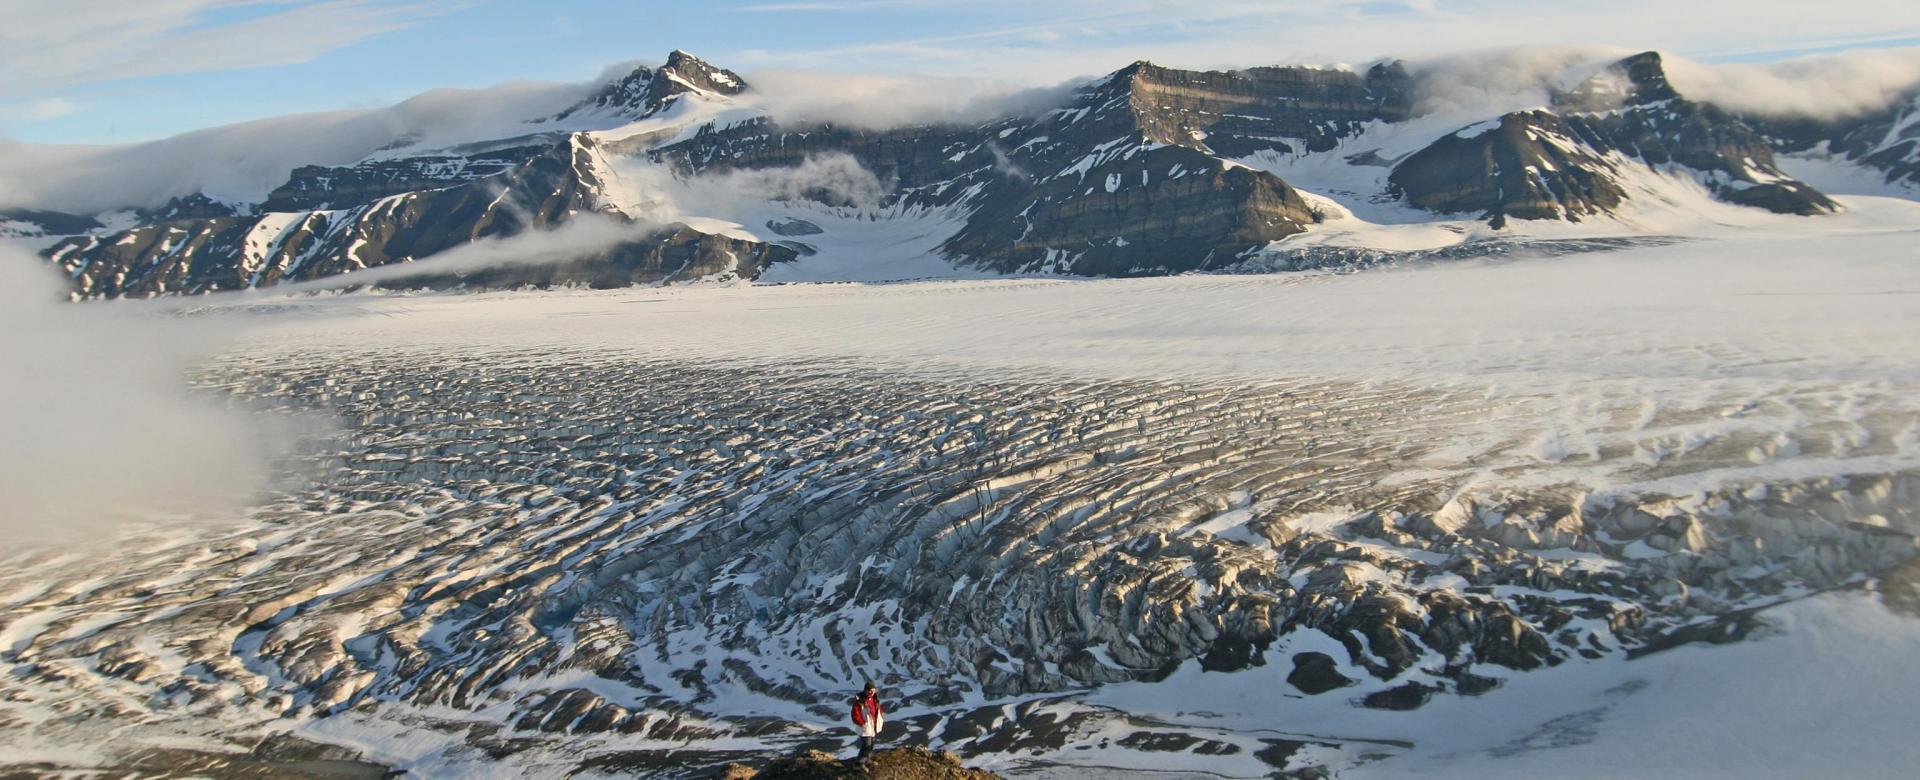 Voyage à pied : Svalbard, latitude nord